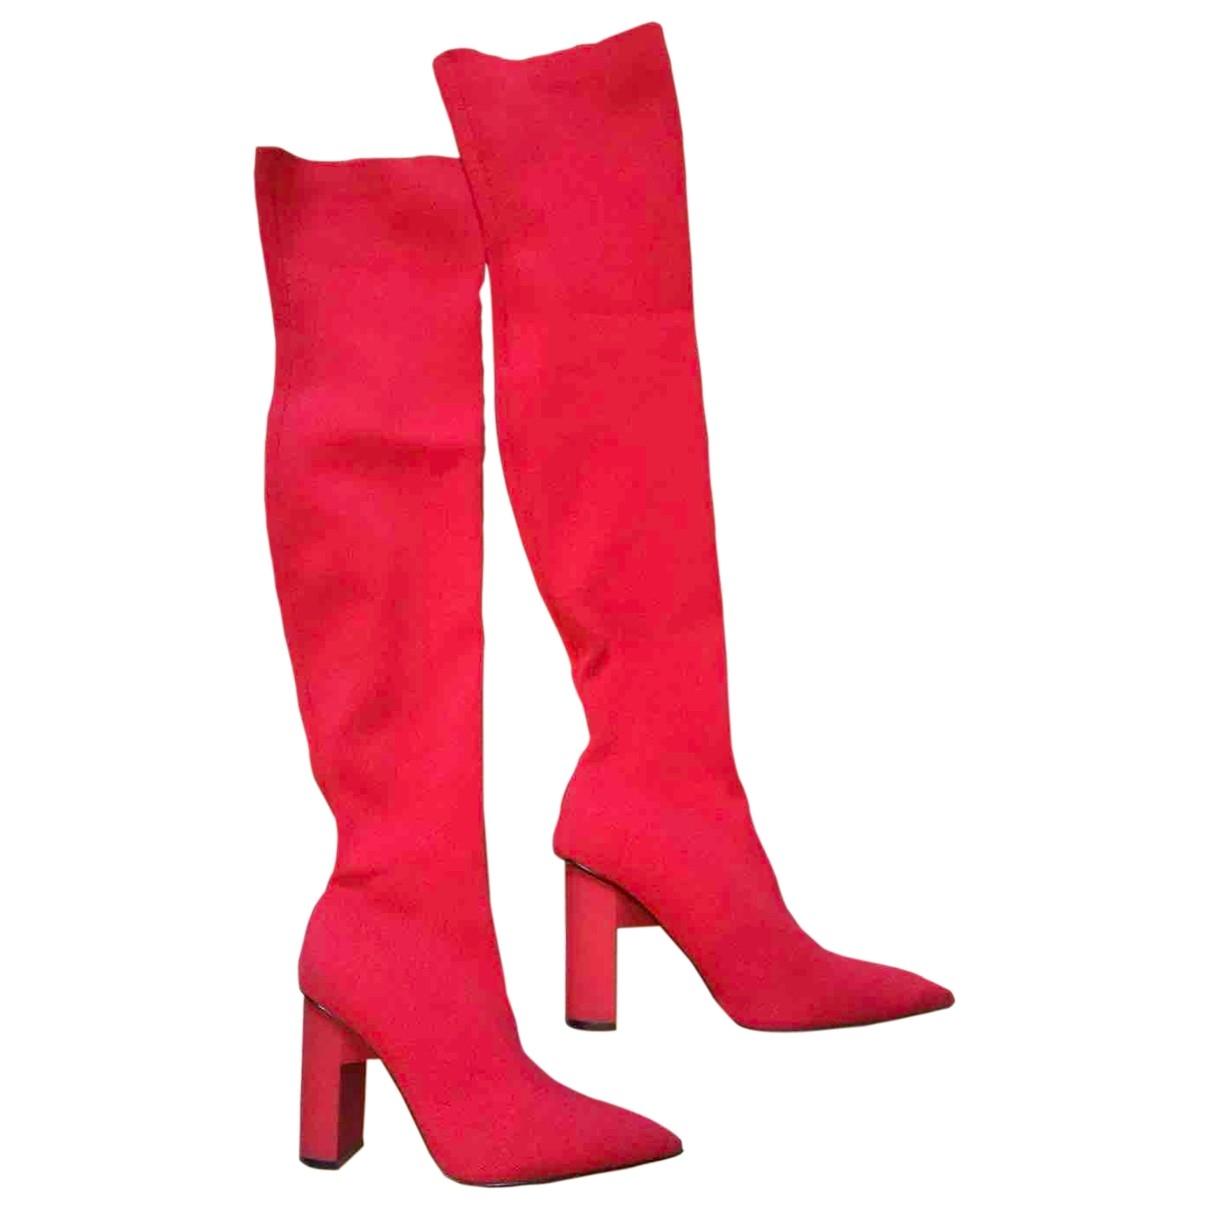 Zara \N Red Boots for Women 39 IT